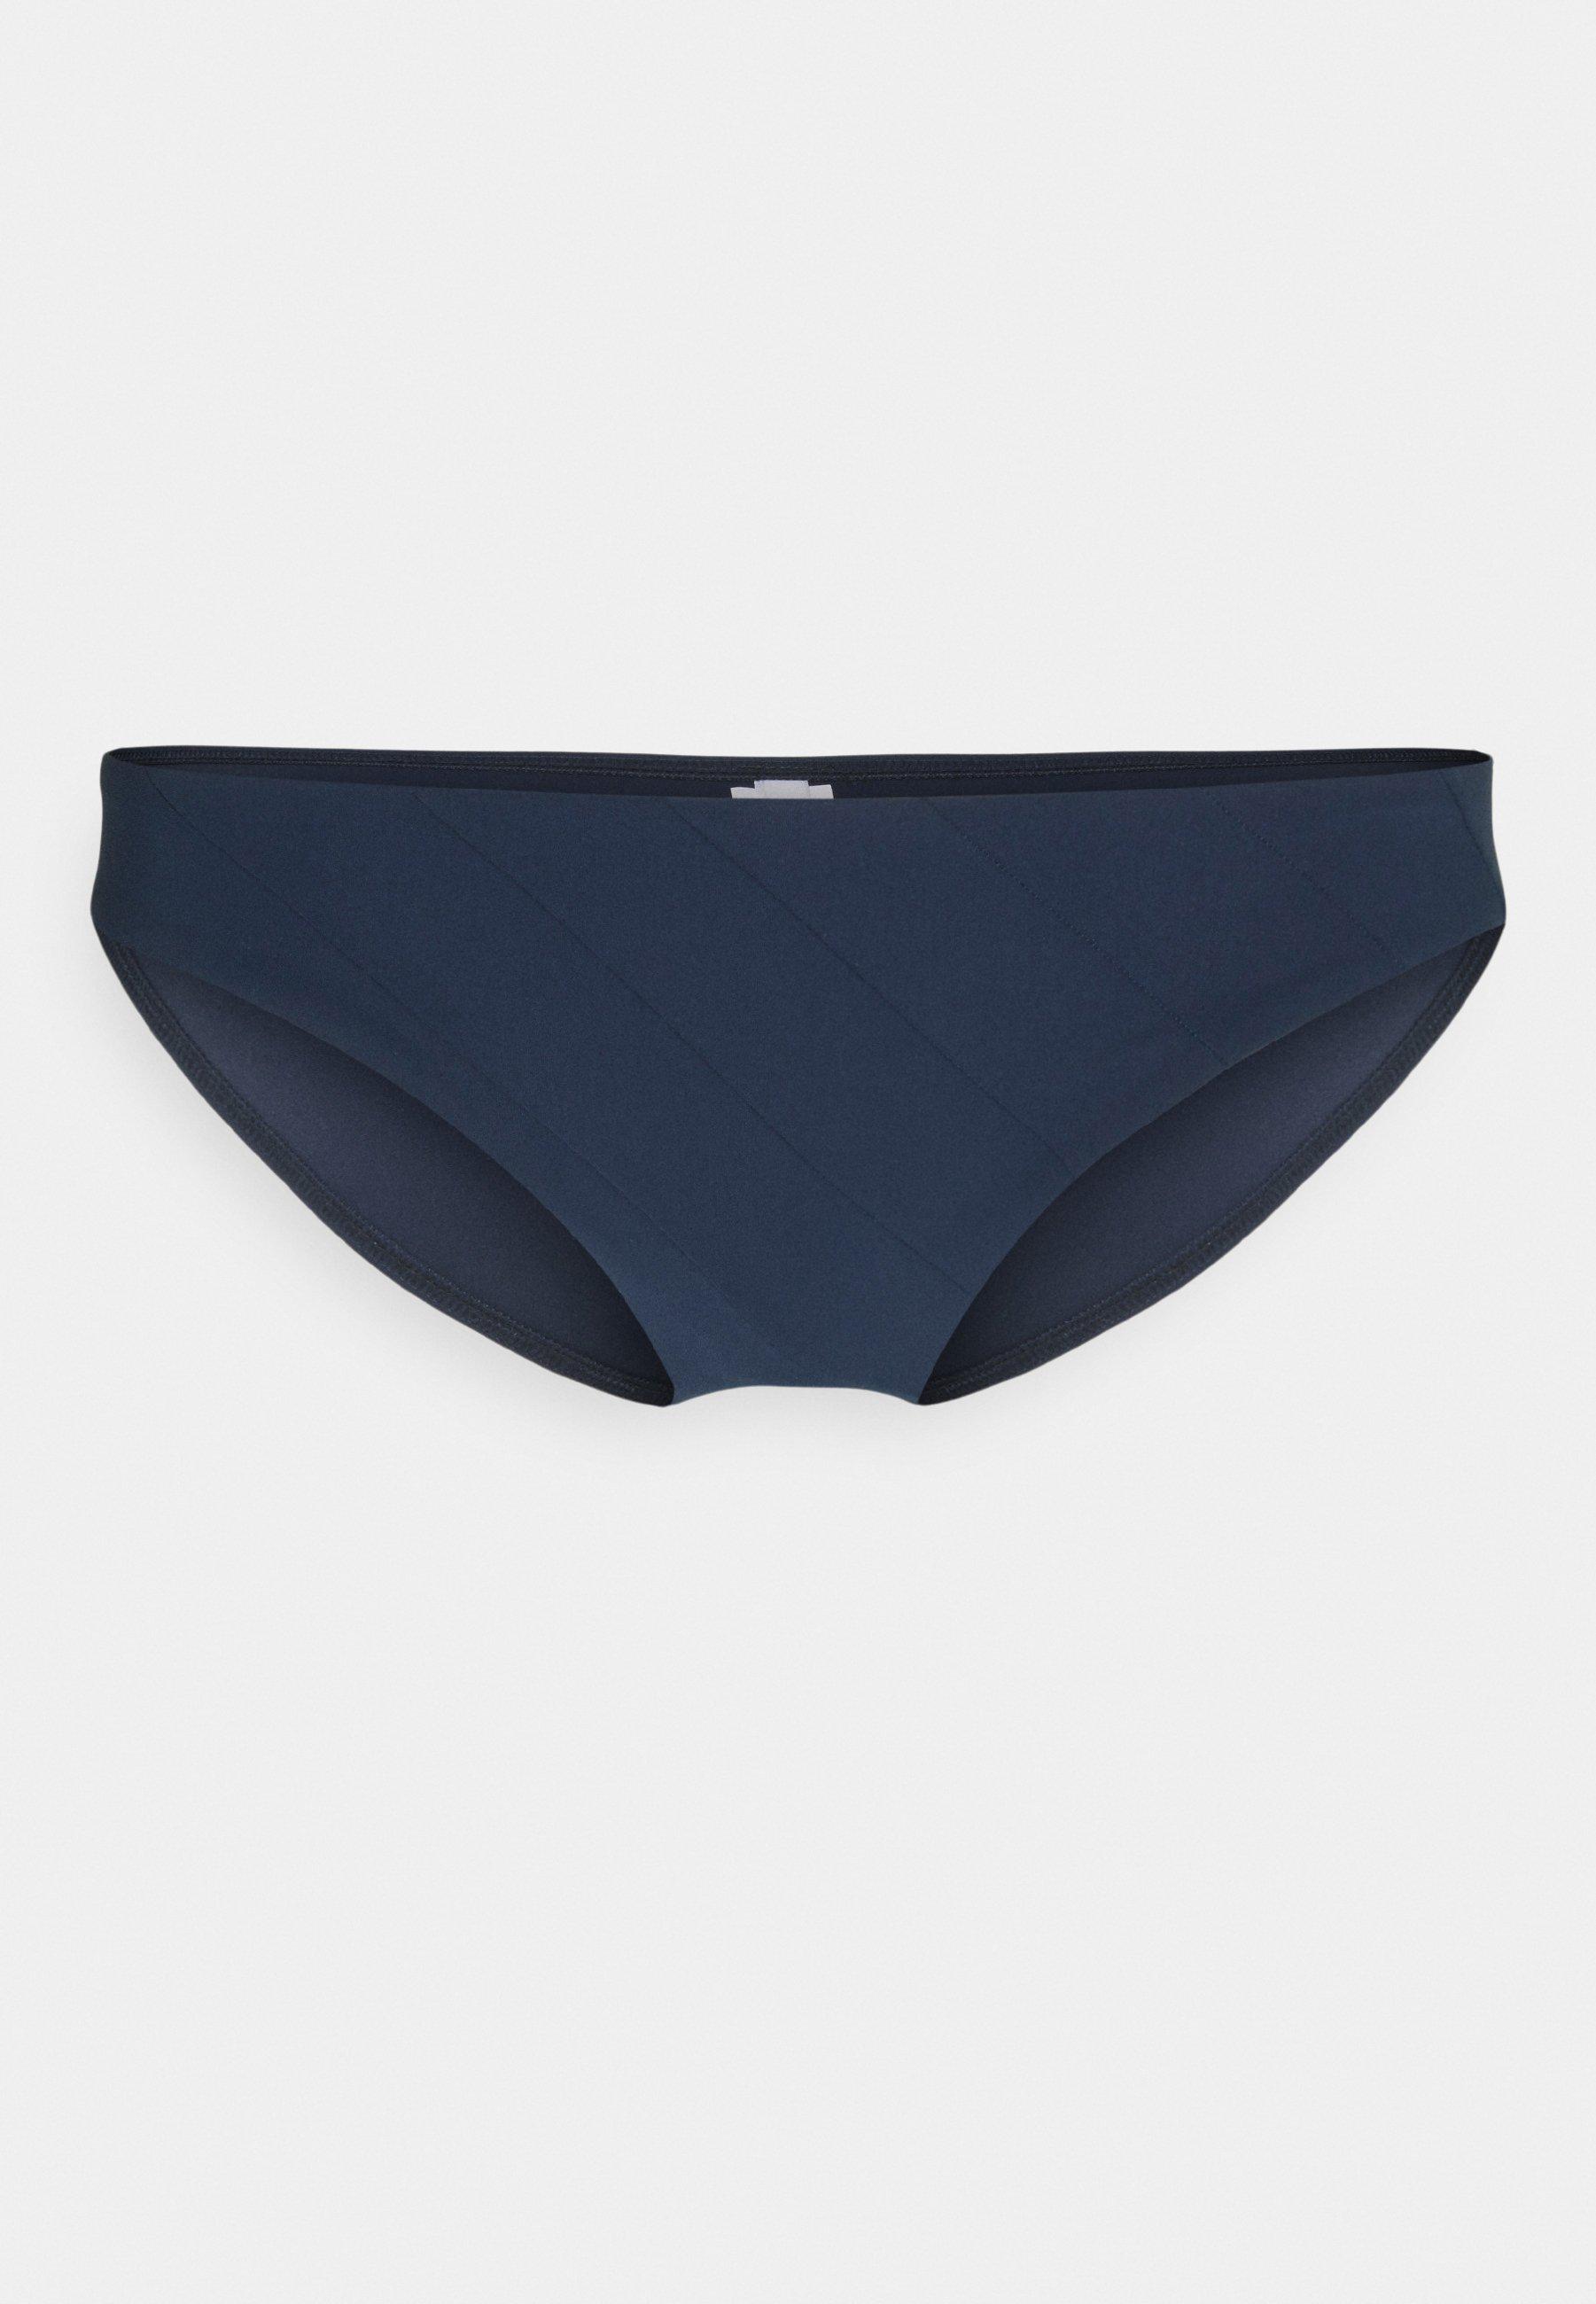 Donna ULTRAMARINE - Bikini pezzo sotto